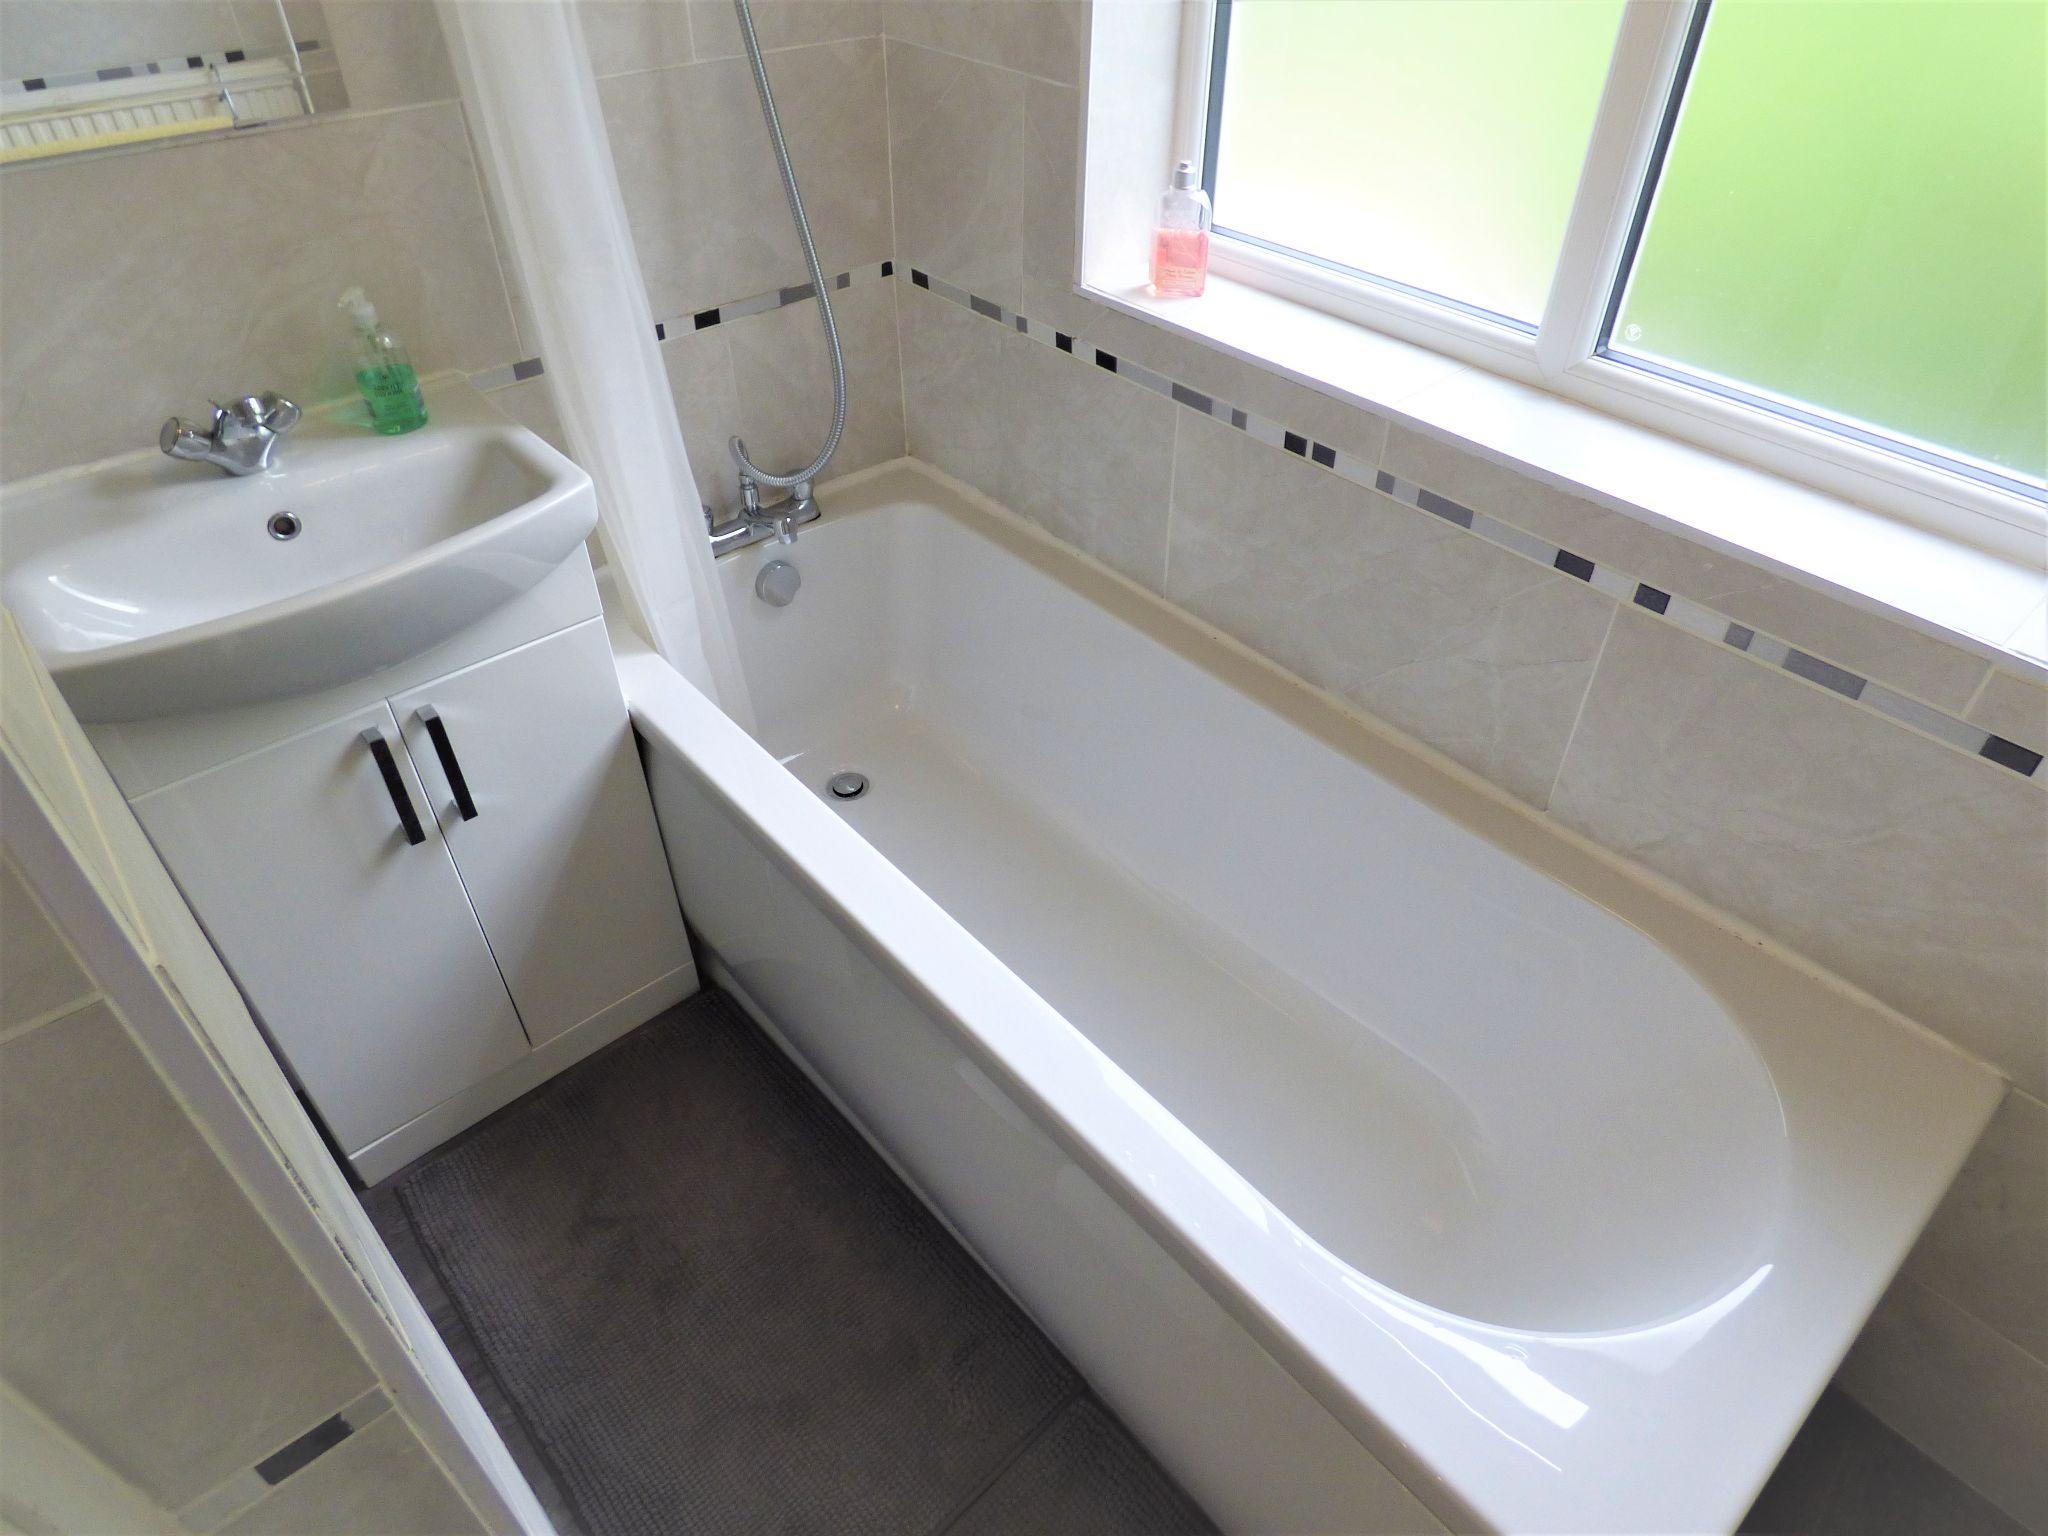 2 Bedroom Semi-detached House For Sale - Bathroom